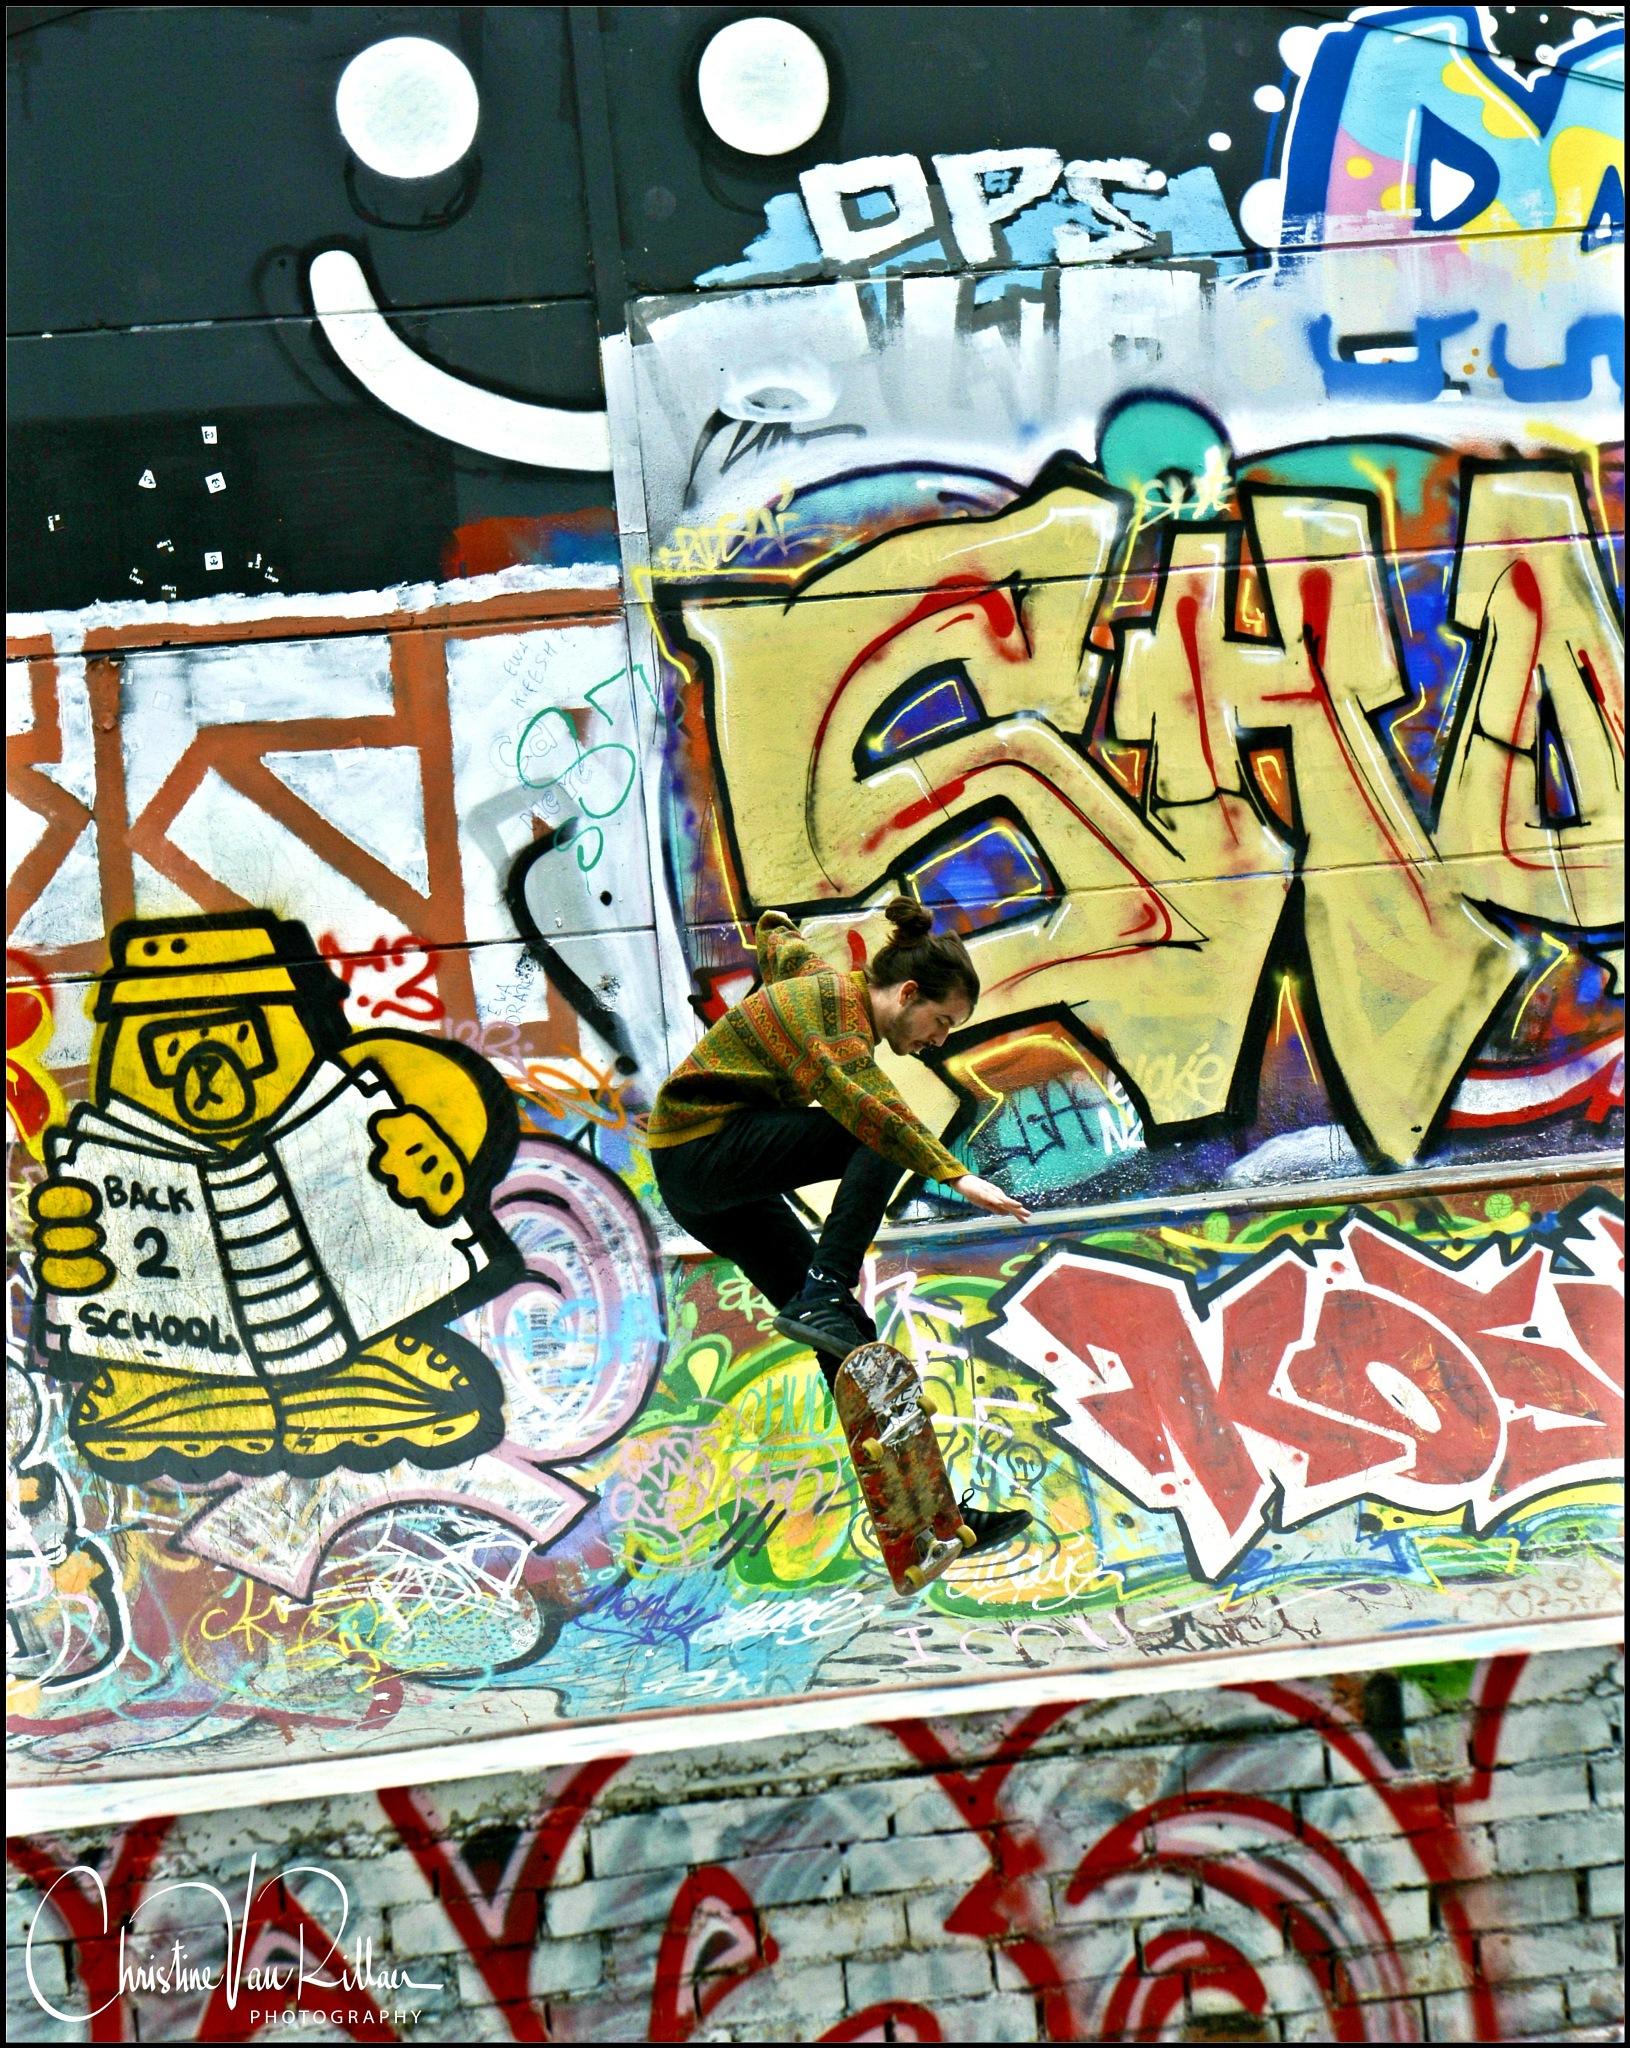 Skate board fun by Chris